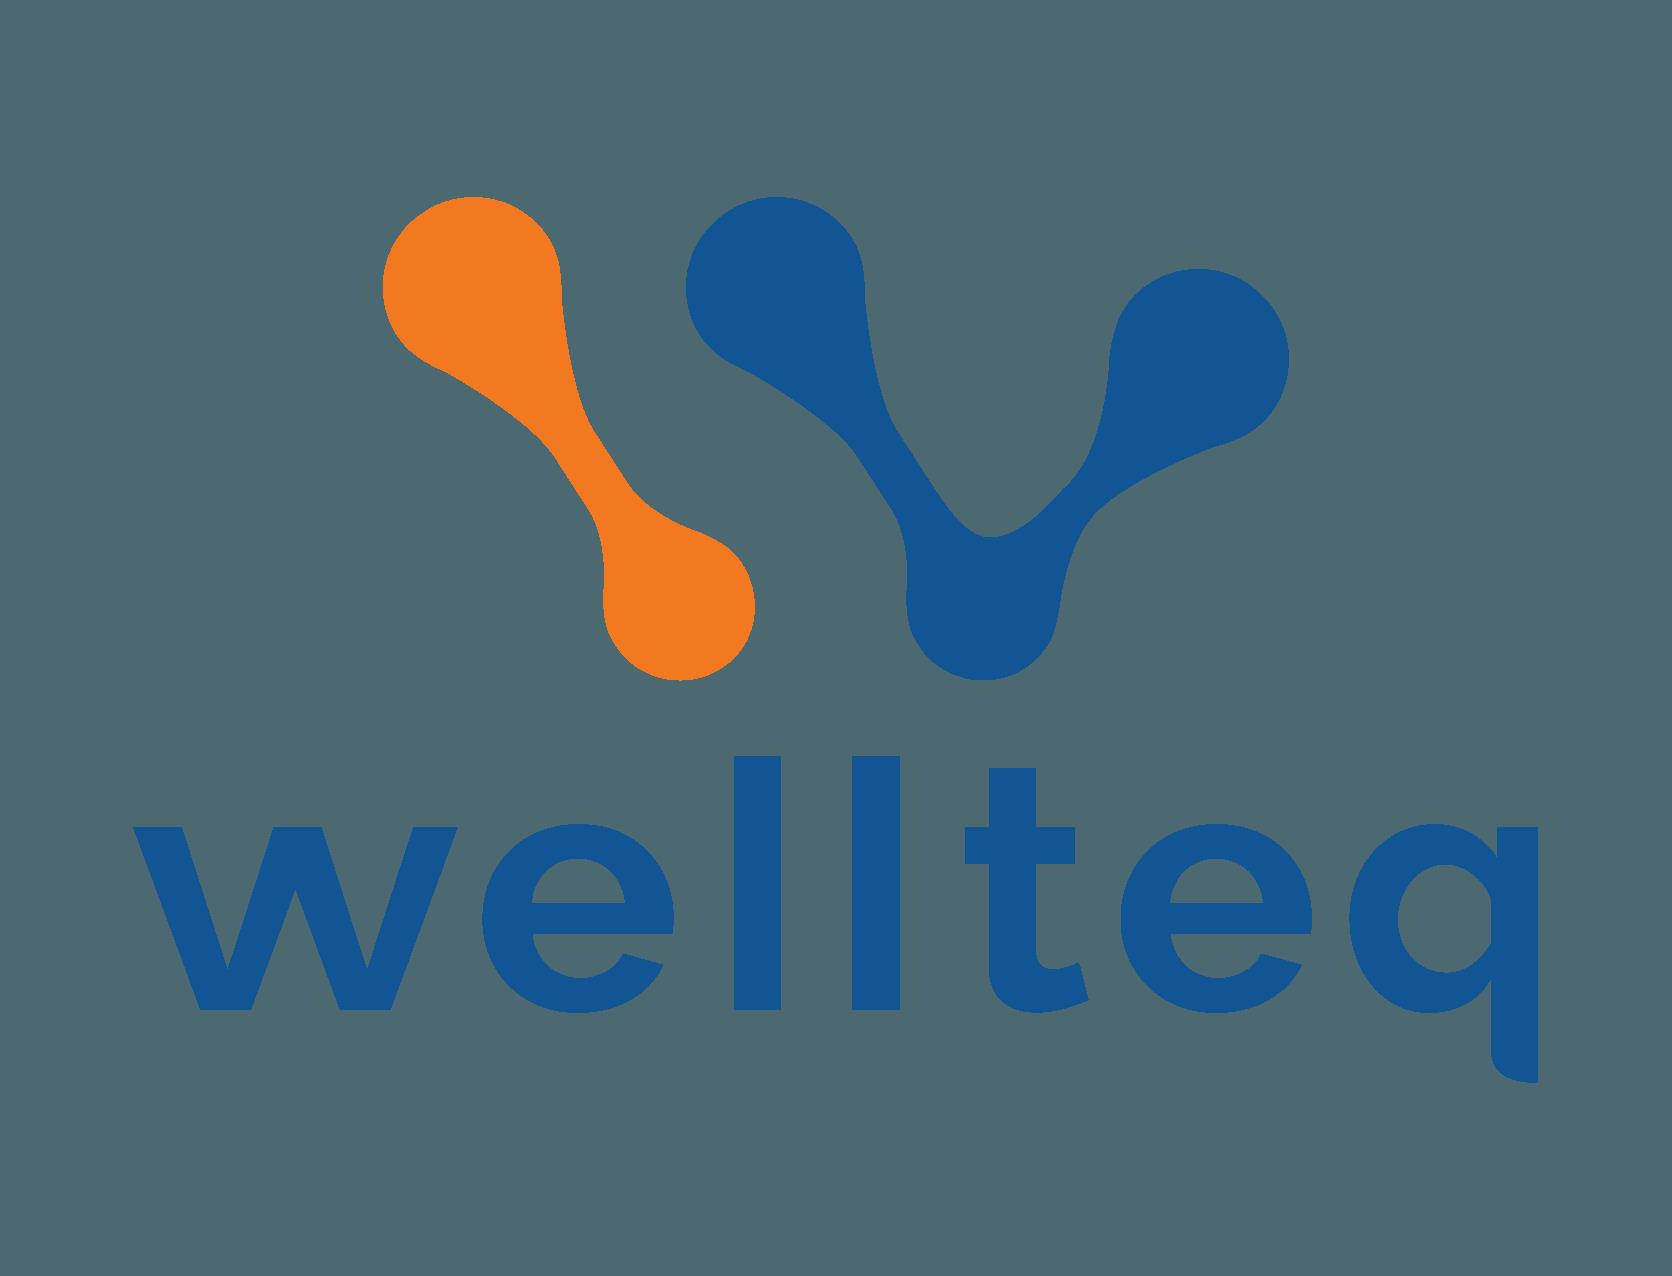 WellteQ